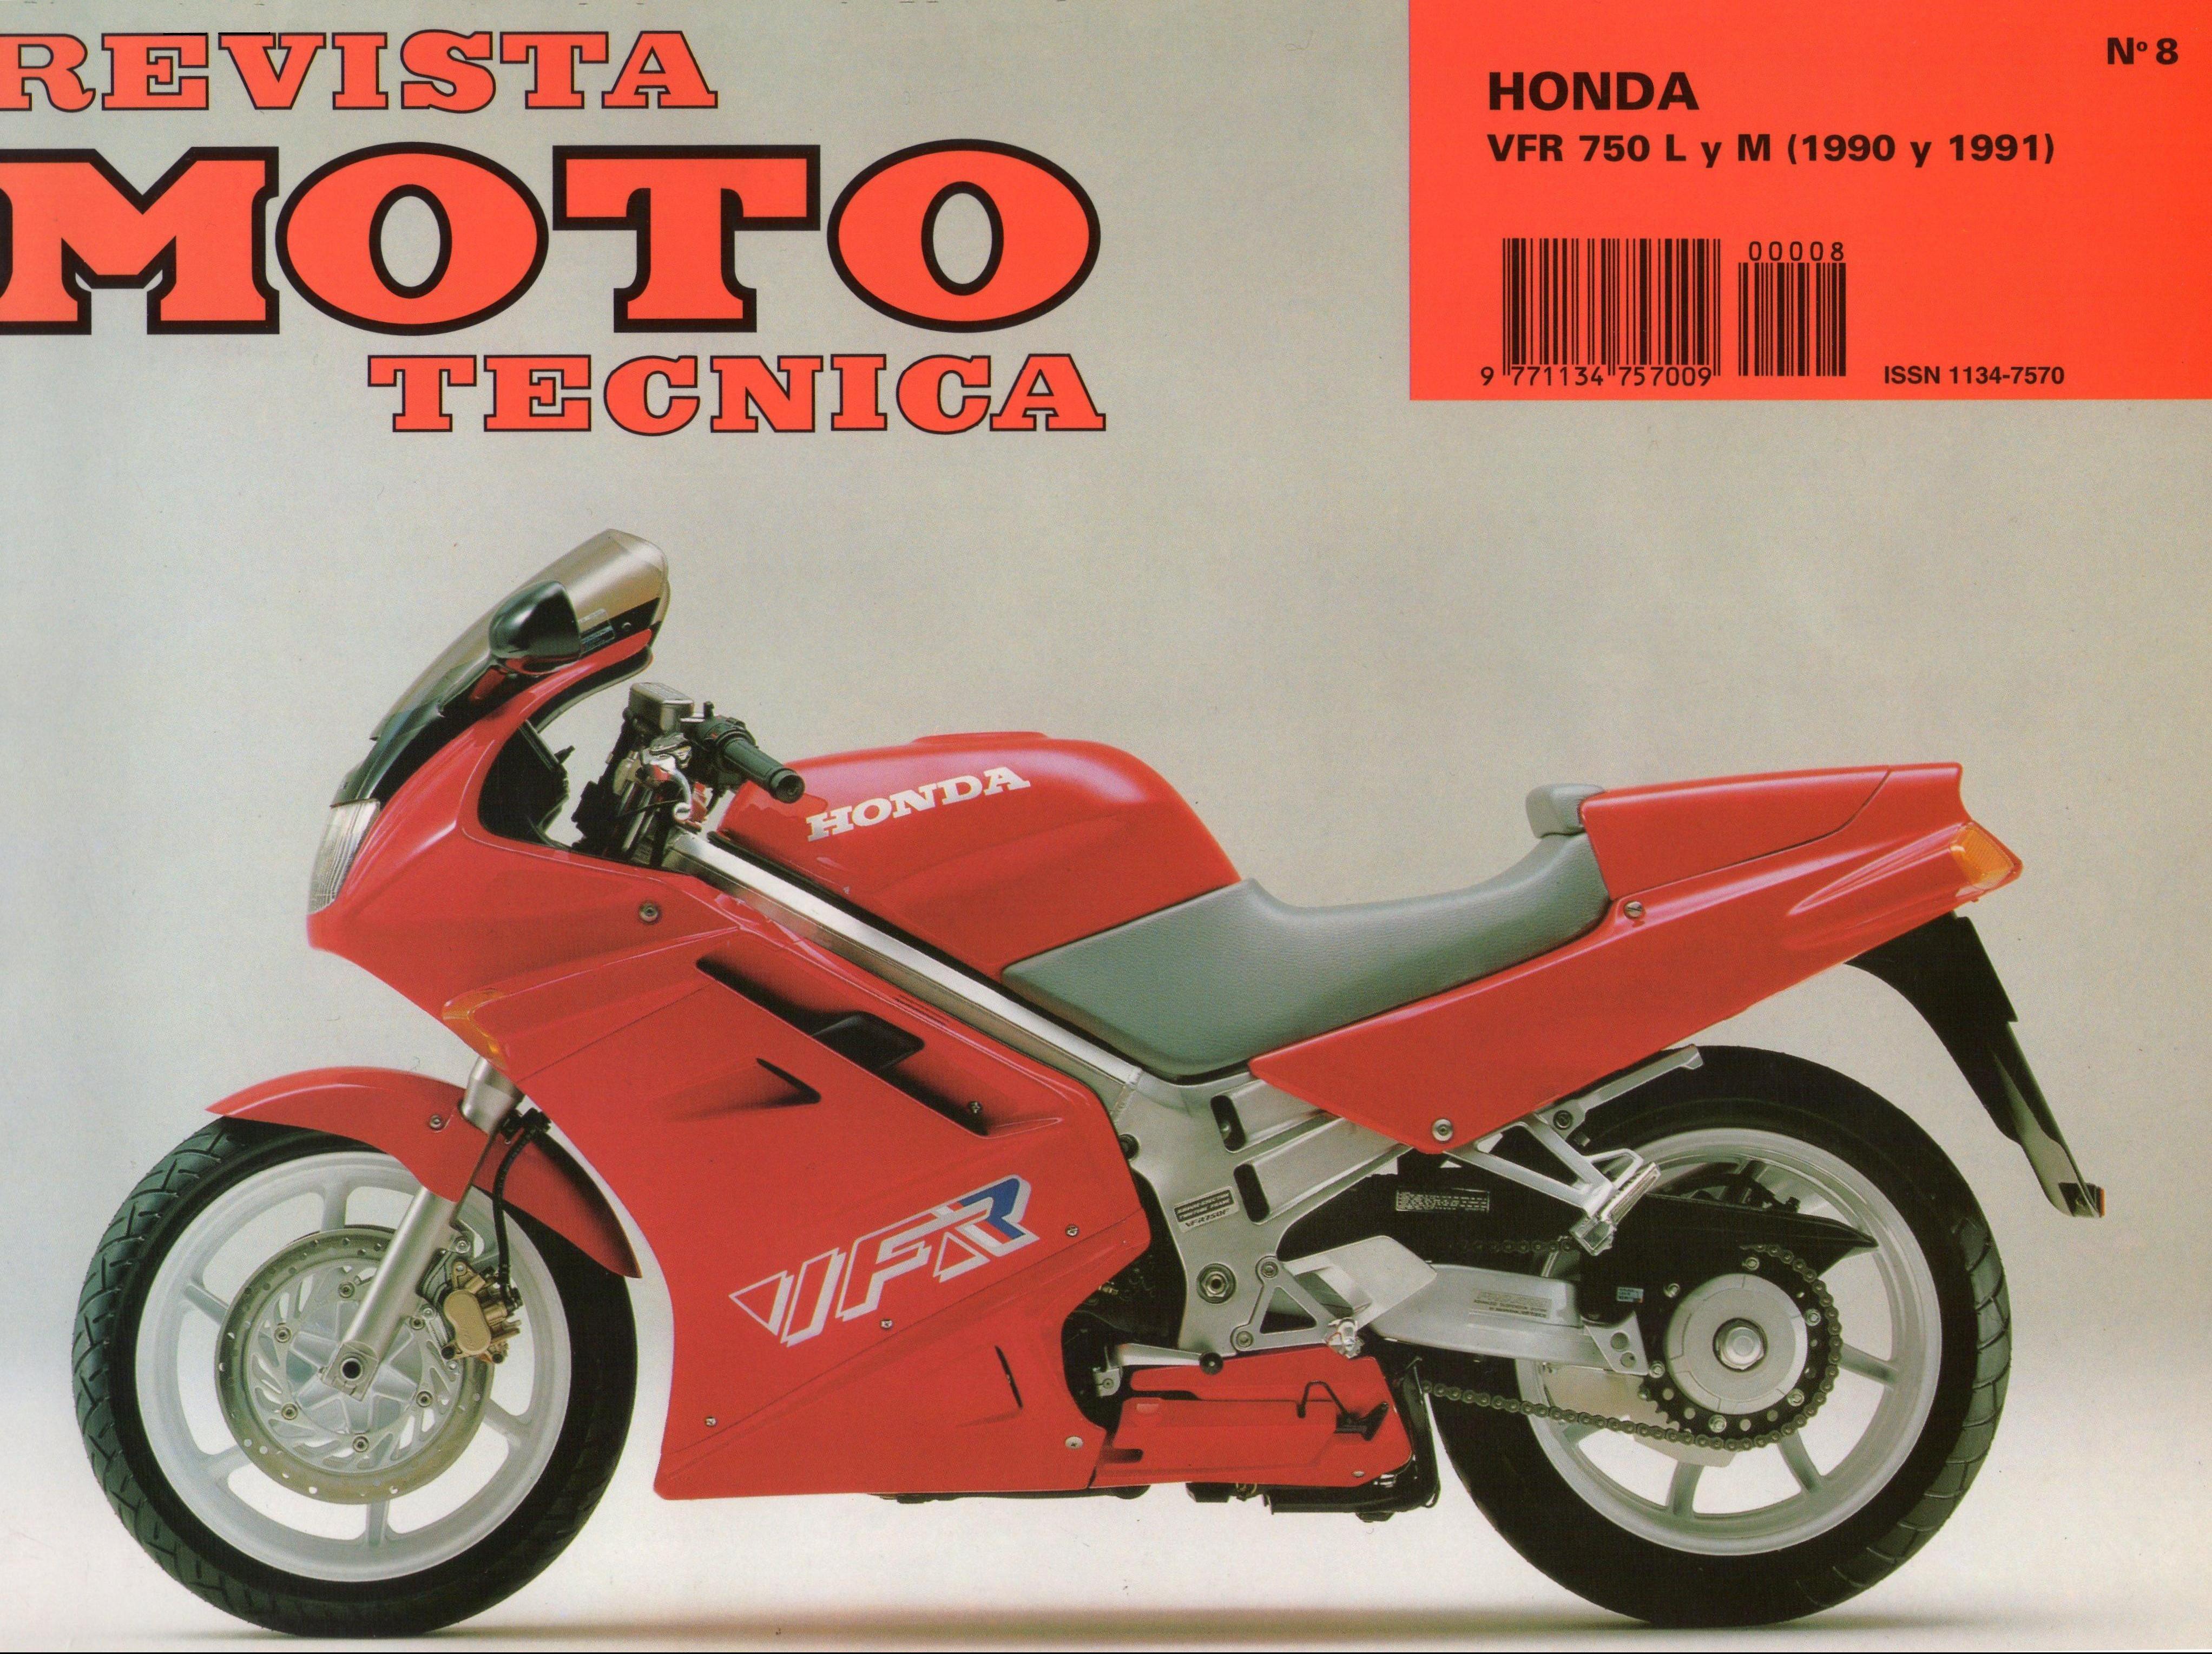 Revista Moto Technica for Honda VFR750L (1990) (Spanish)